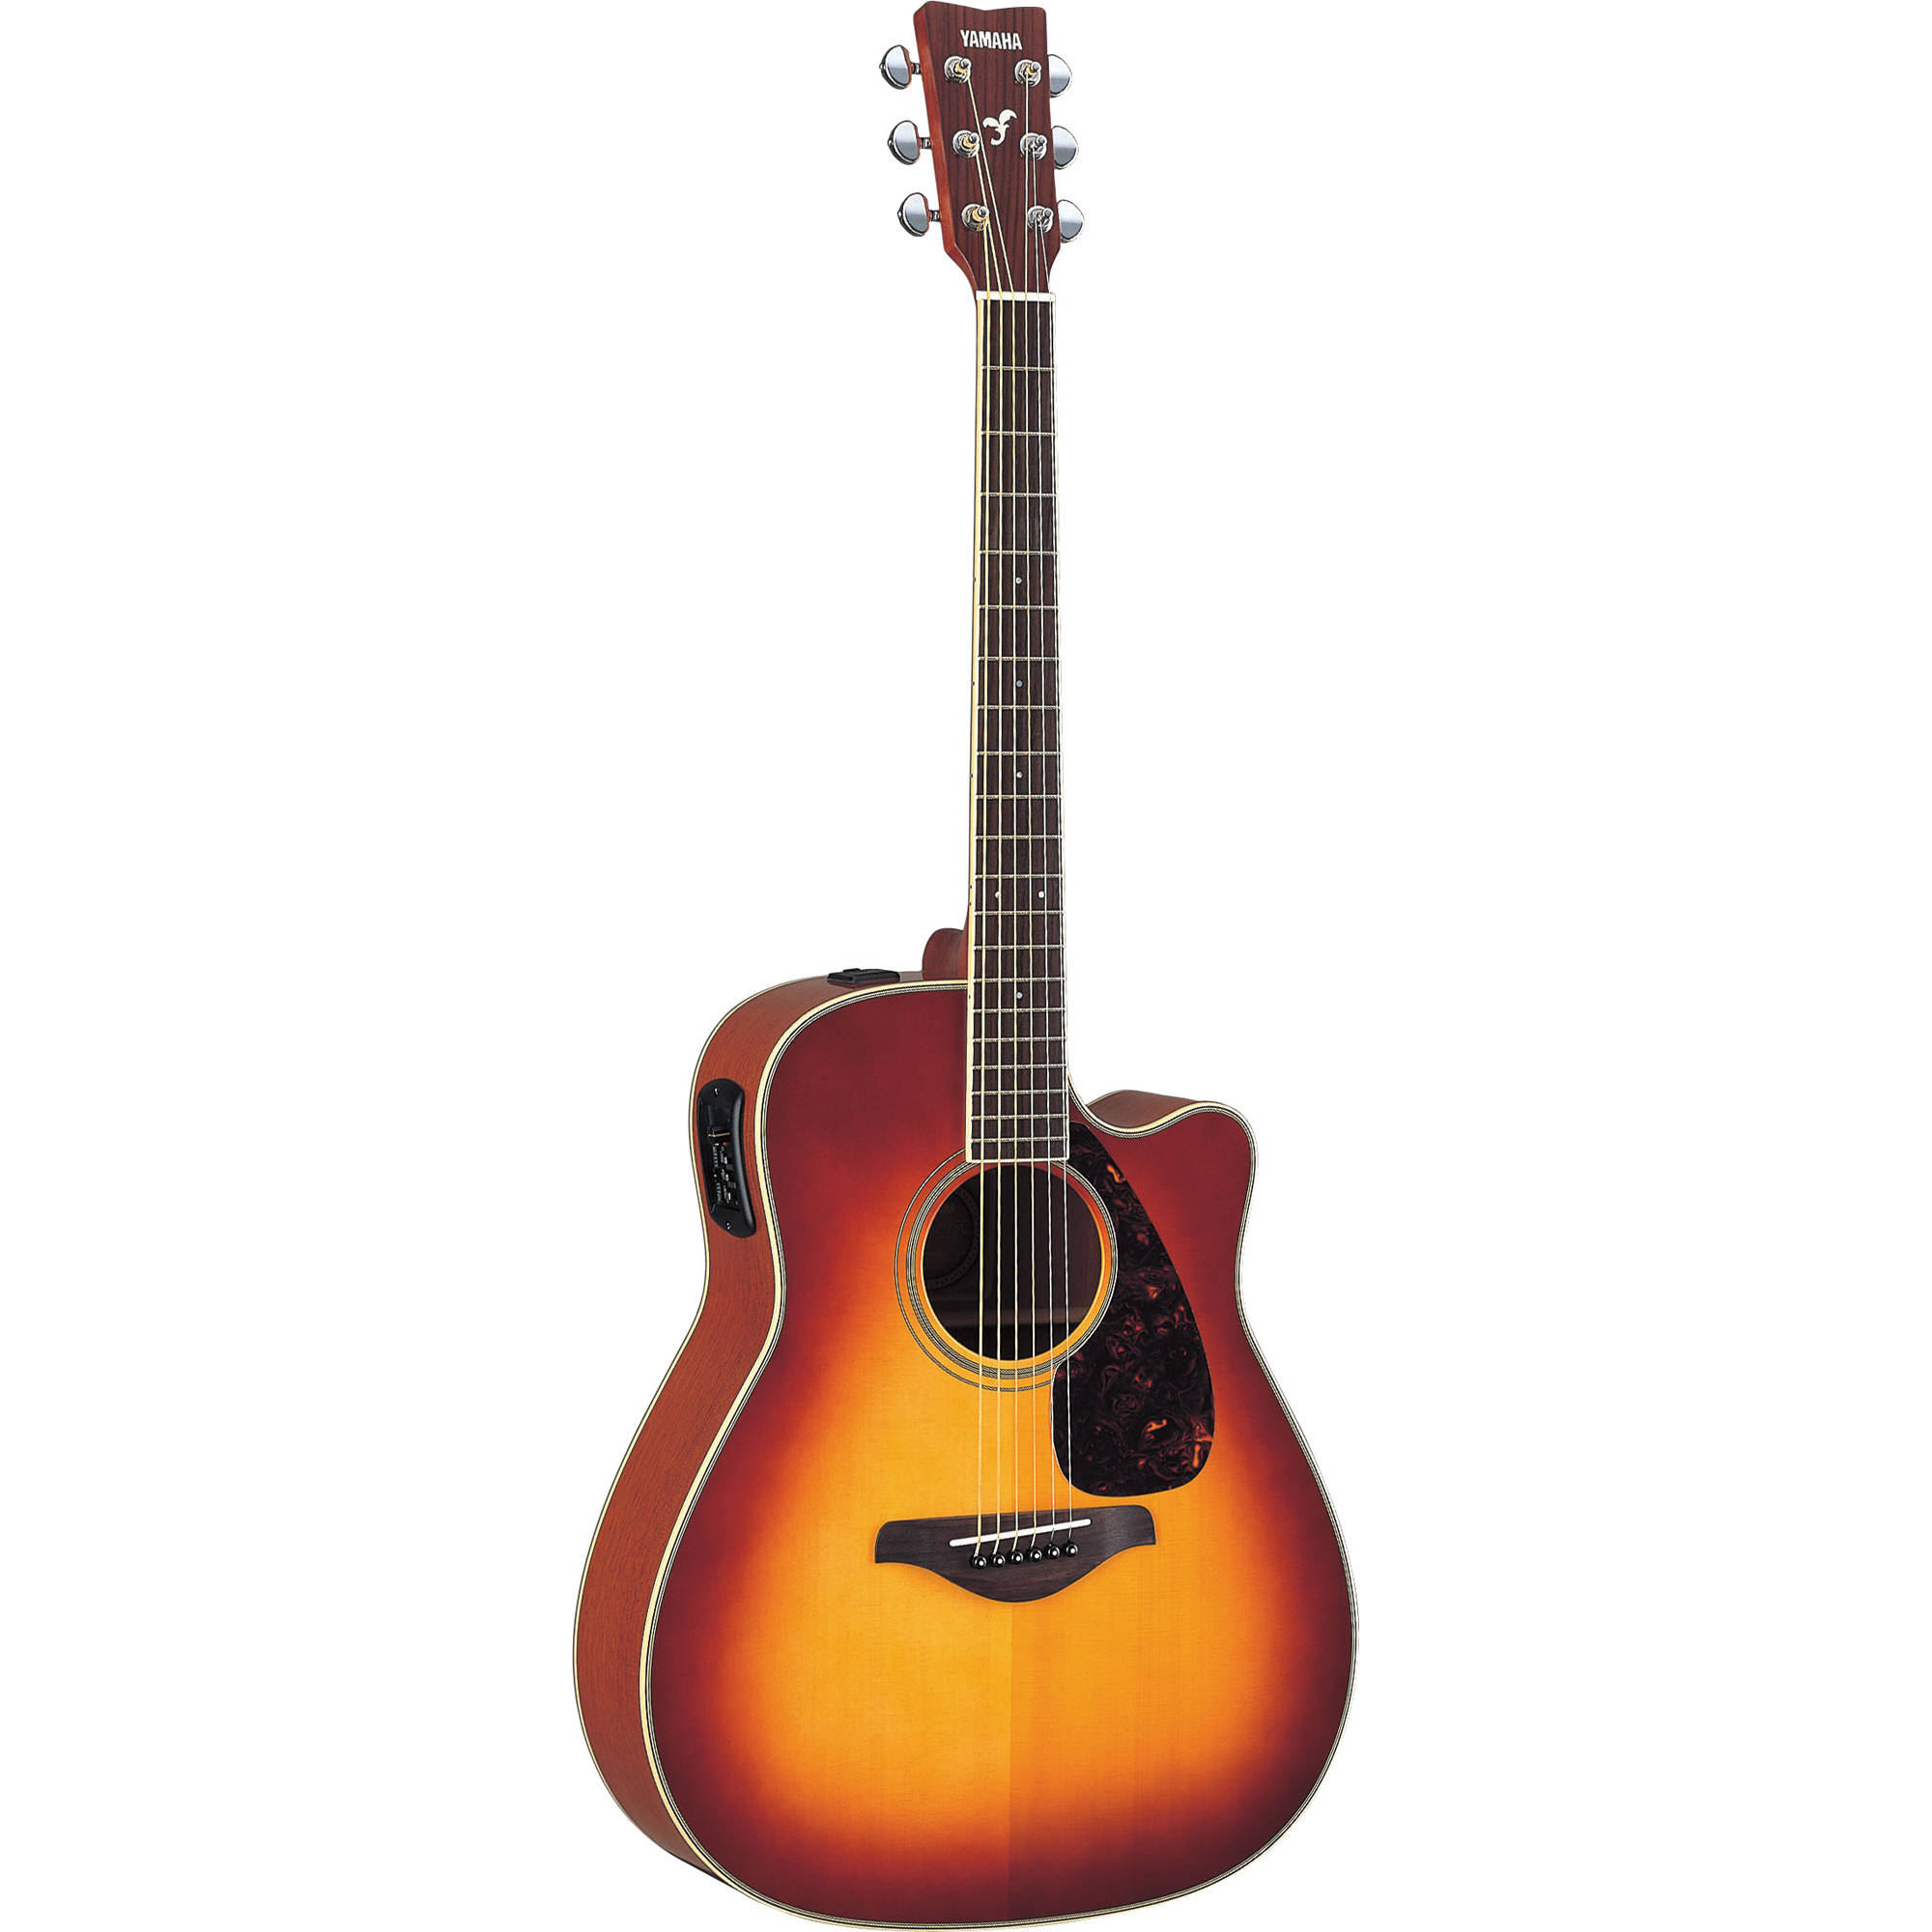 Yamaha Fgx Sca Acoustic Guitar